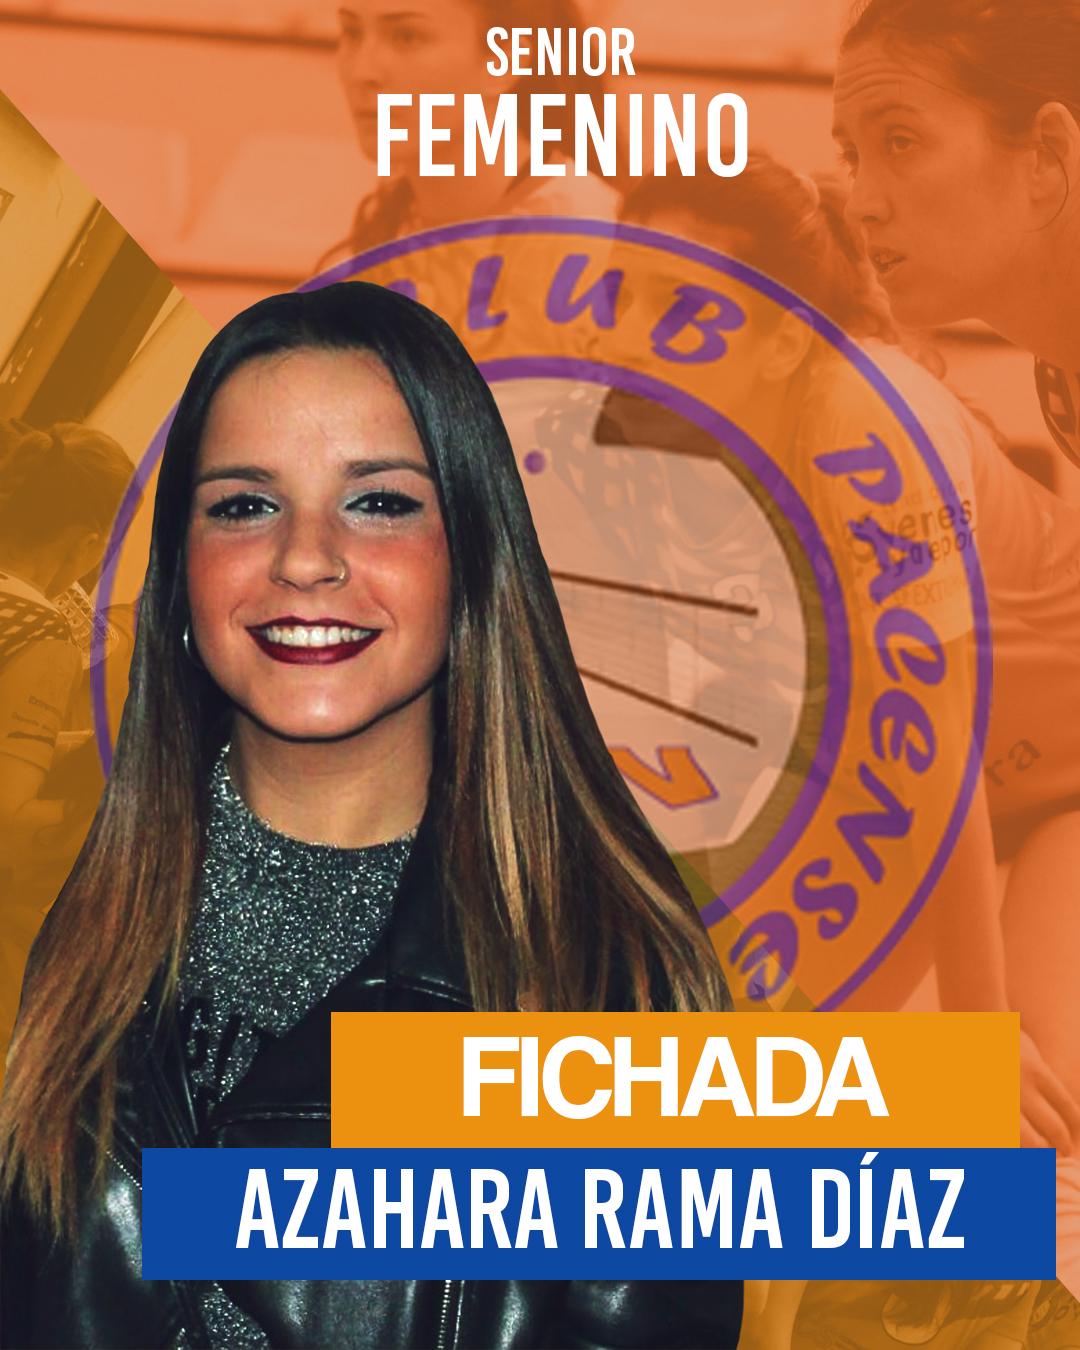 El Extremadura Hotel Río Badajoz ficha a Azahara Rama